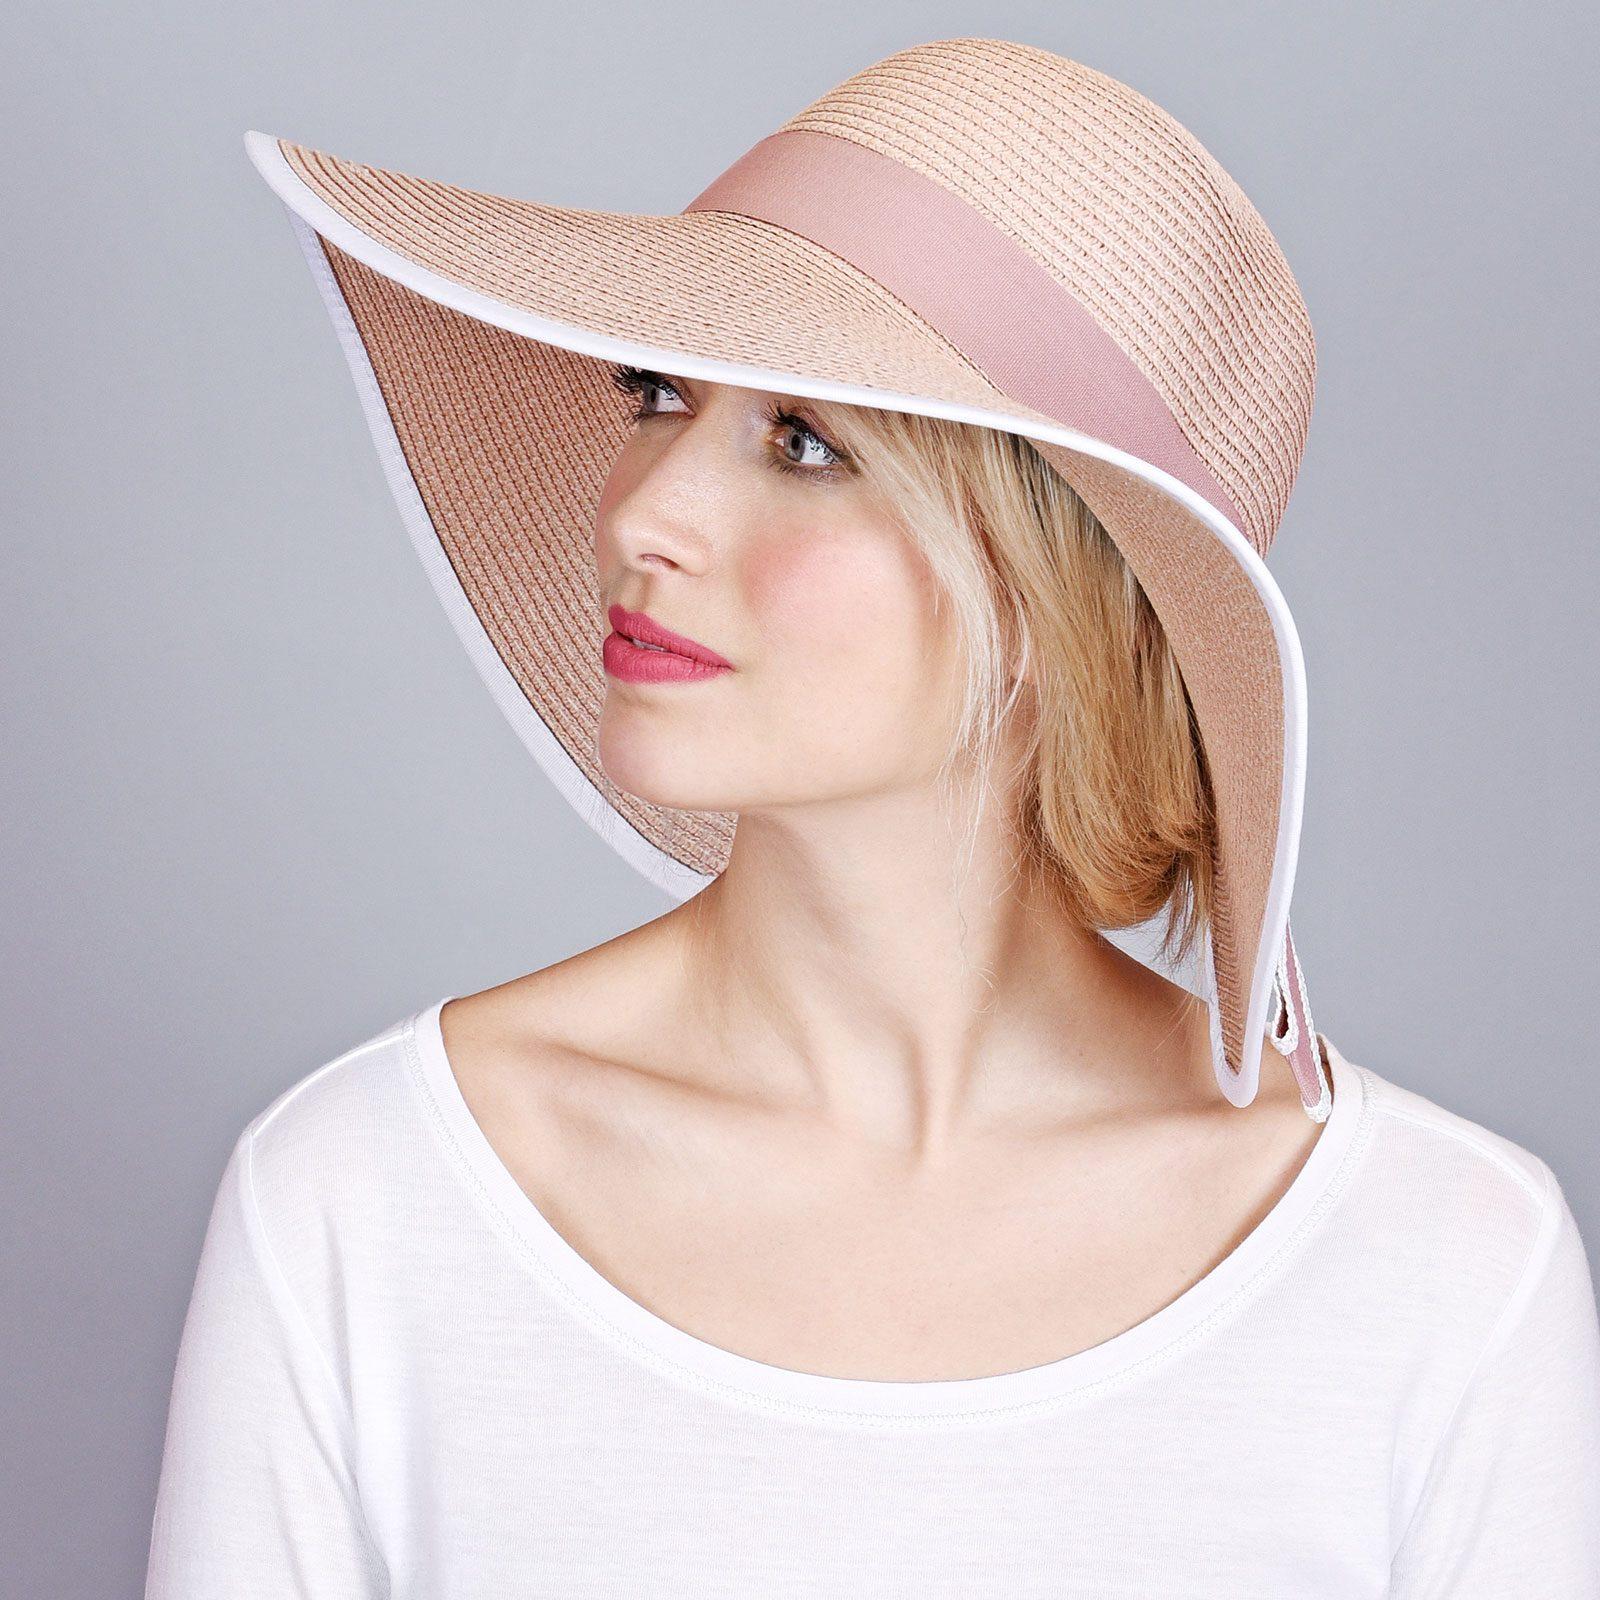 http://lookbook.allee-du-foulard.fr/wp-content/uploads/2018/06/CP-00896-VF16-1-capeline-femme-rose-ruban-noeud-1600x1600.jpg